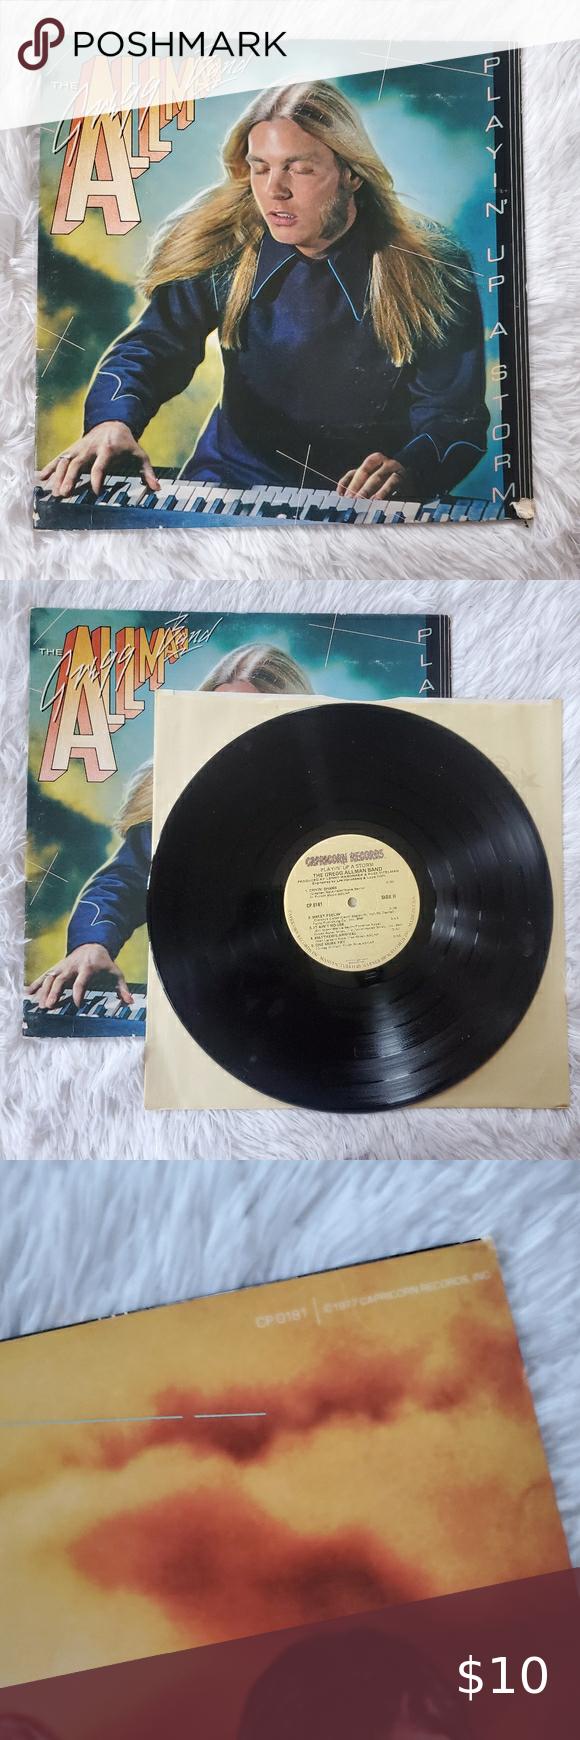 Gregg Allman Band Playin Up A Storm 1977 Vinyl In 2020 Vinyl Greggs Storm